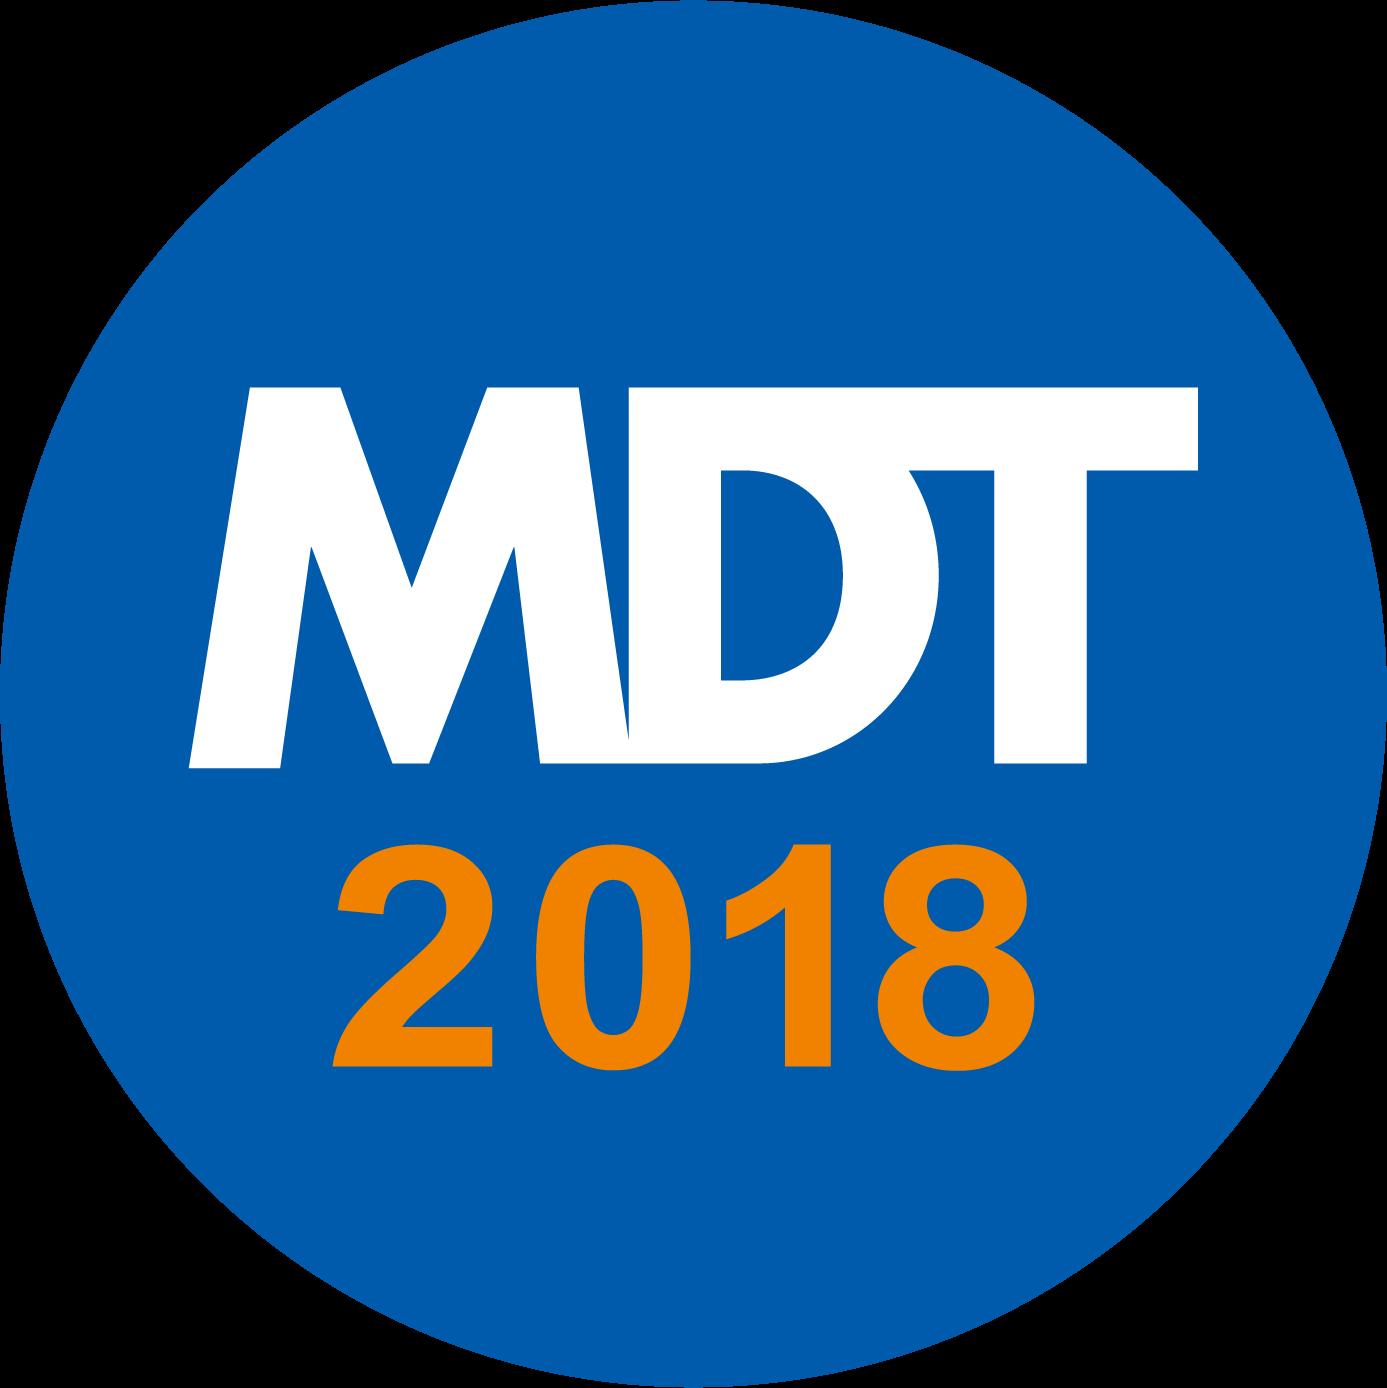 MDT2018